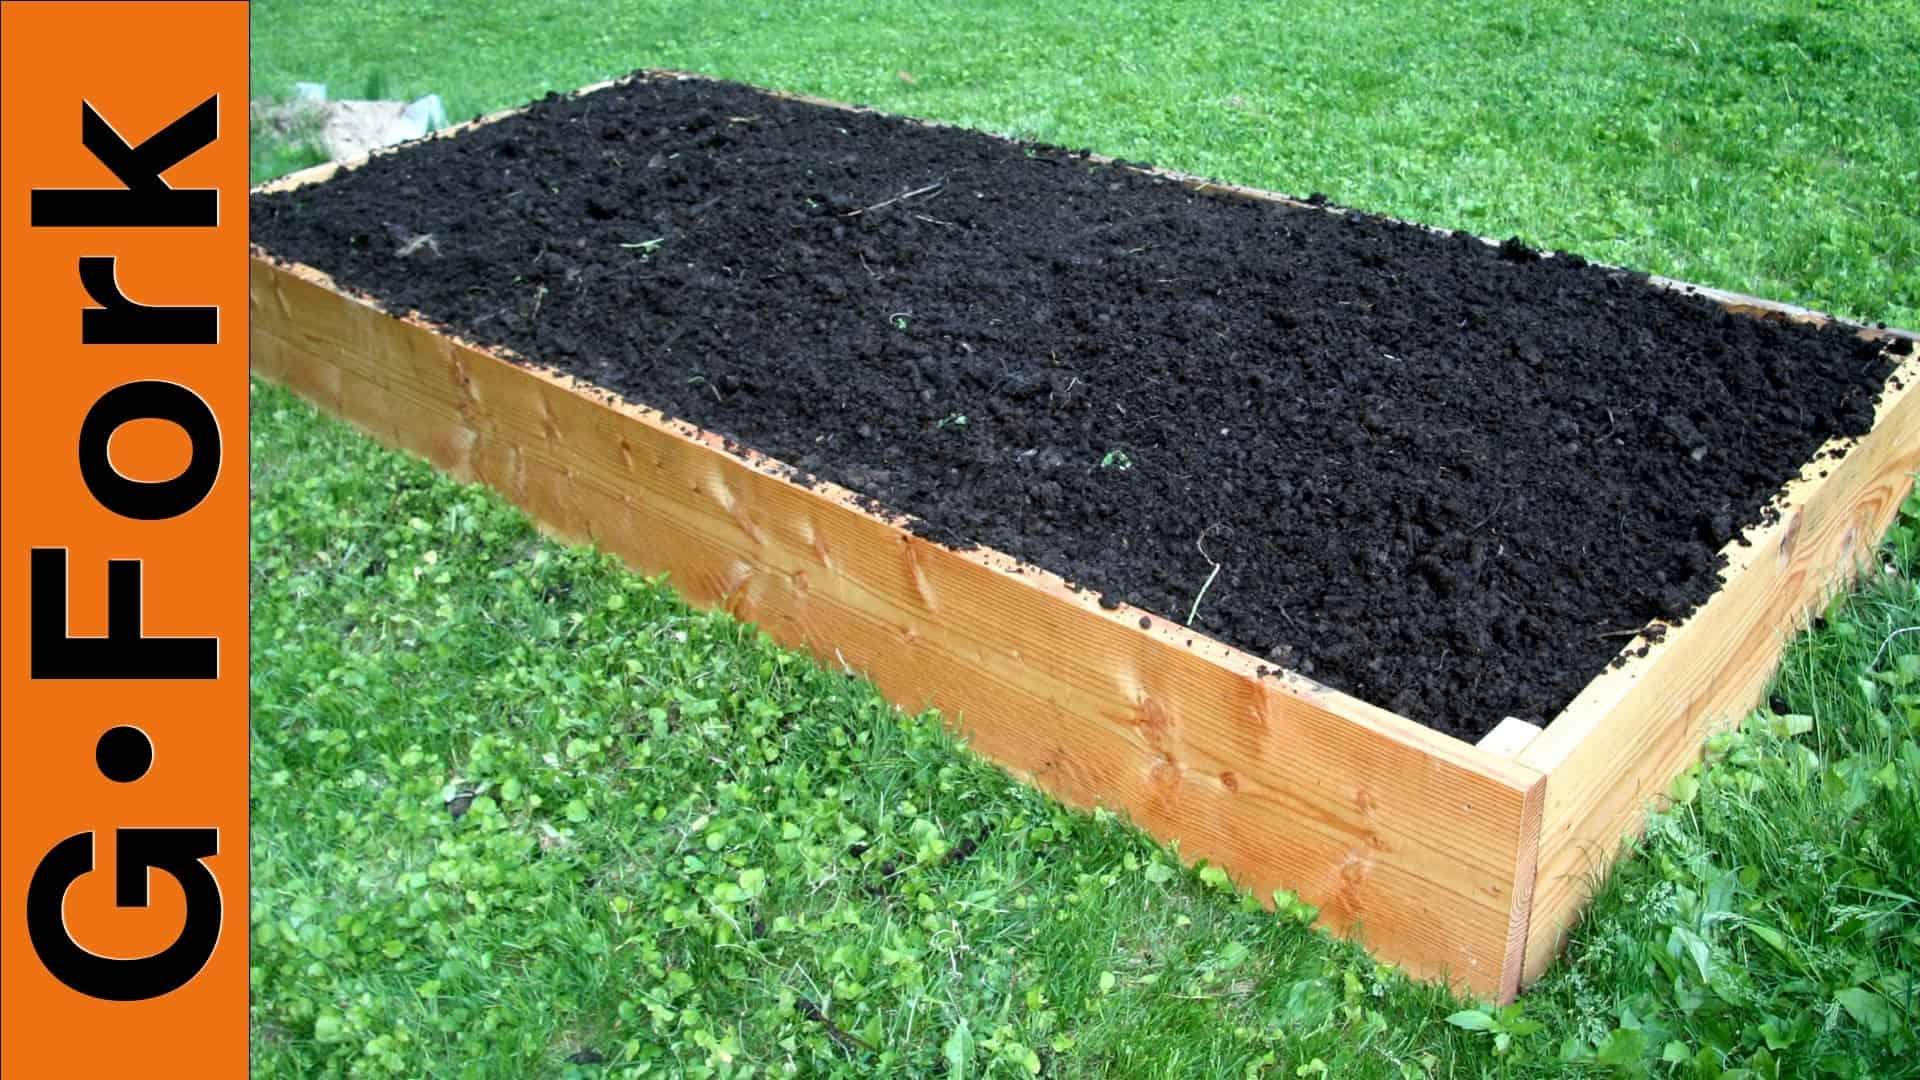 How To Build A Raised Bed For Vegetables Or Flowers GF TV Video   DIY  Living   GardenFork.TV